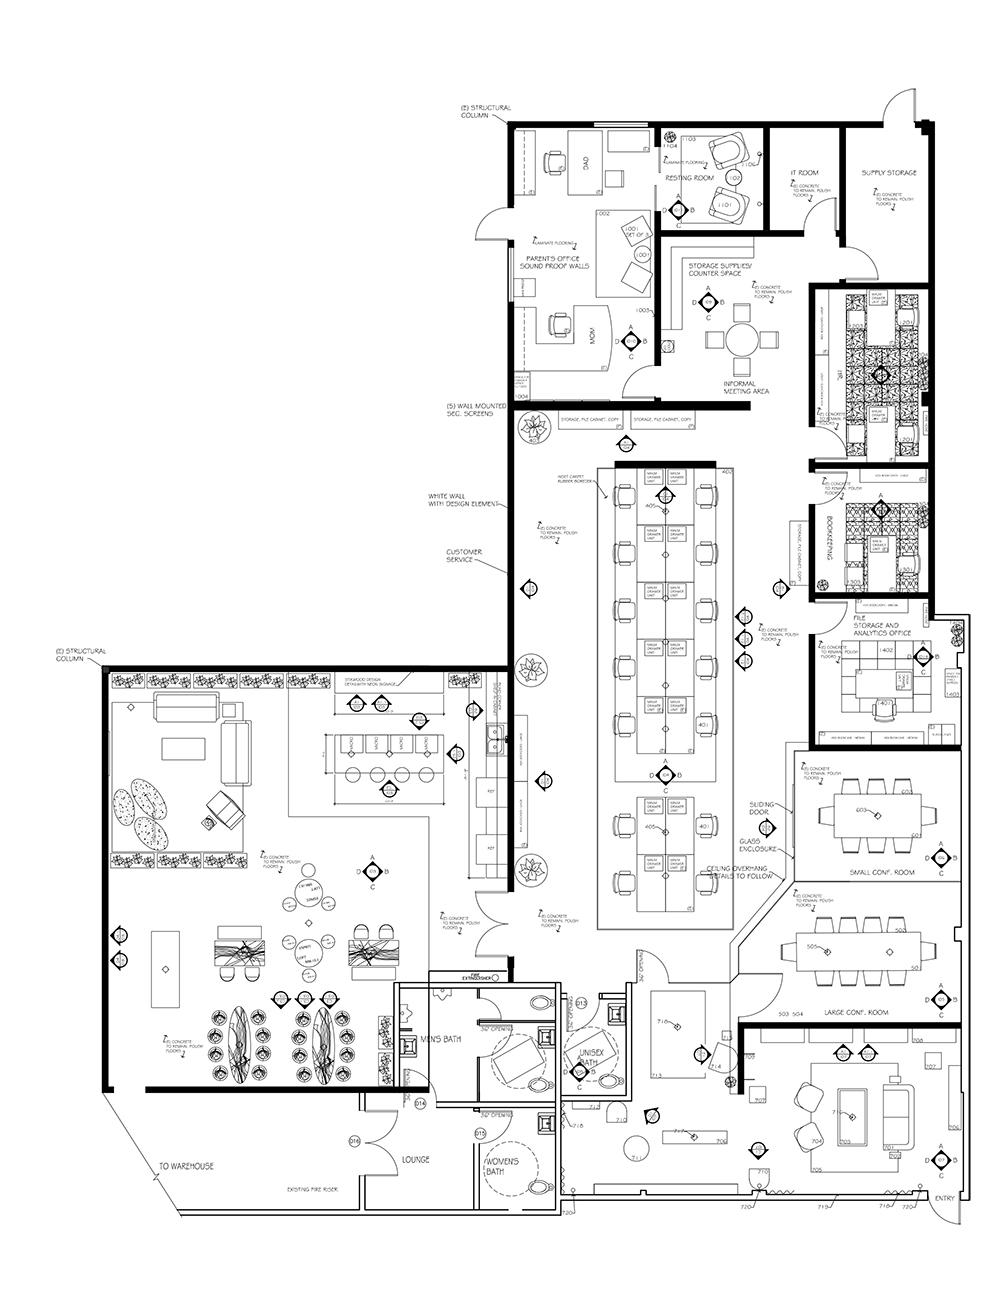 autocad drawings studio 9 interior design wordpress carousel free version